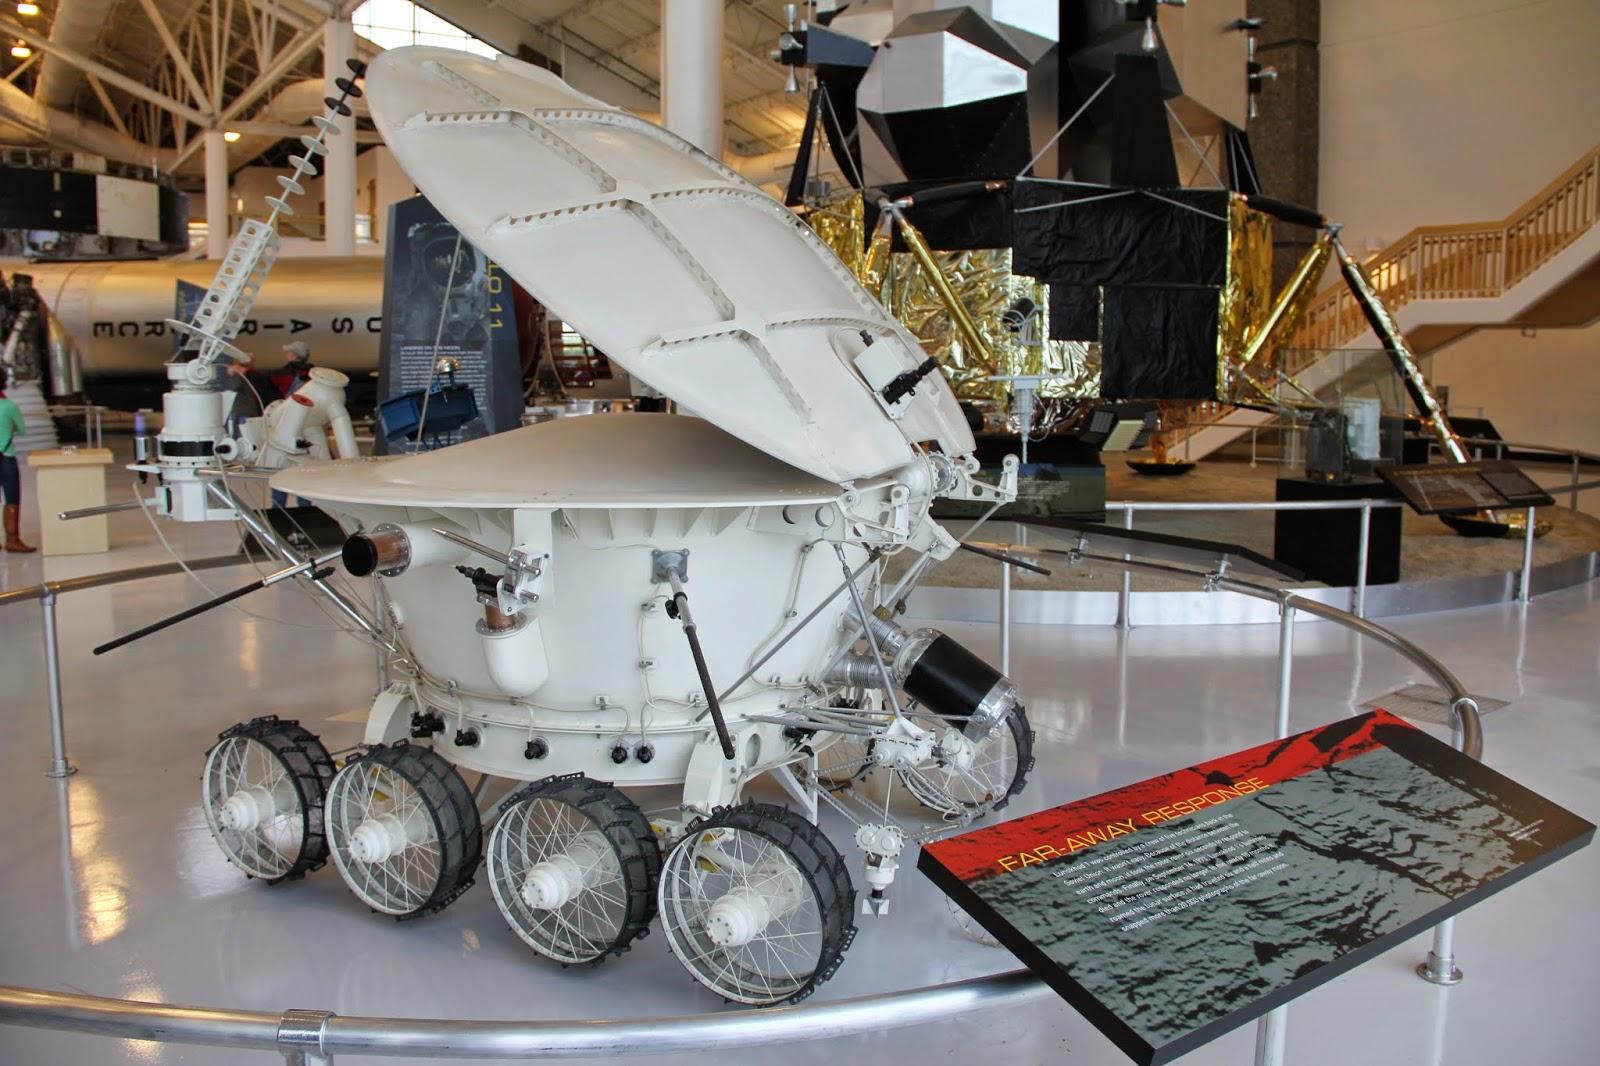 Tetramorph Avionics: My Experience Building a Lunar Rover ...